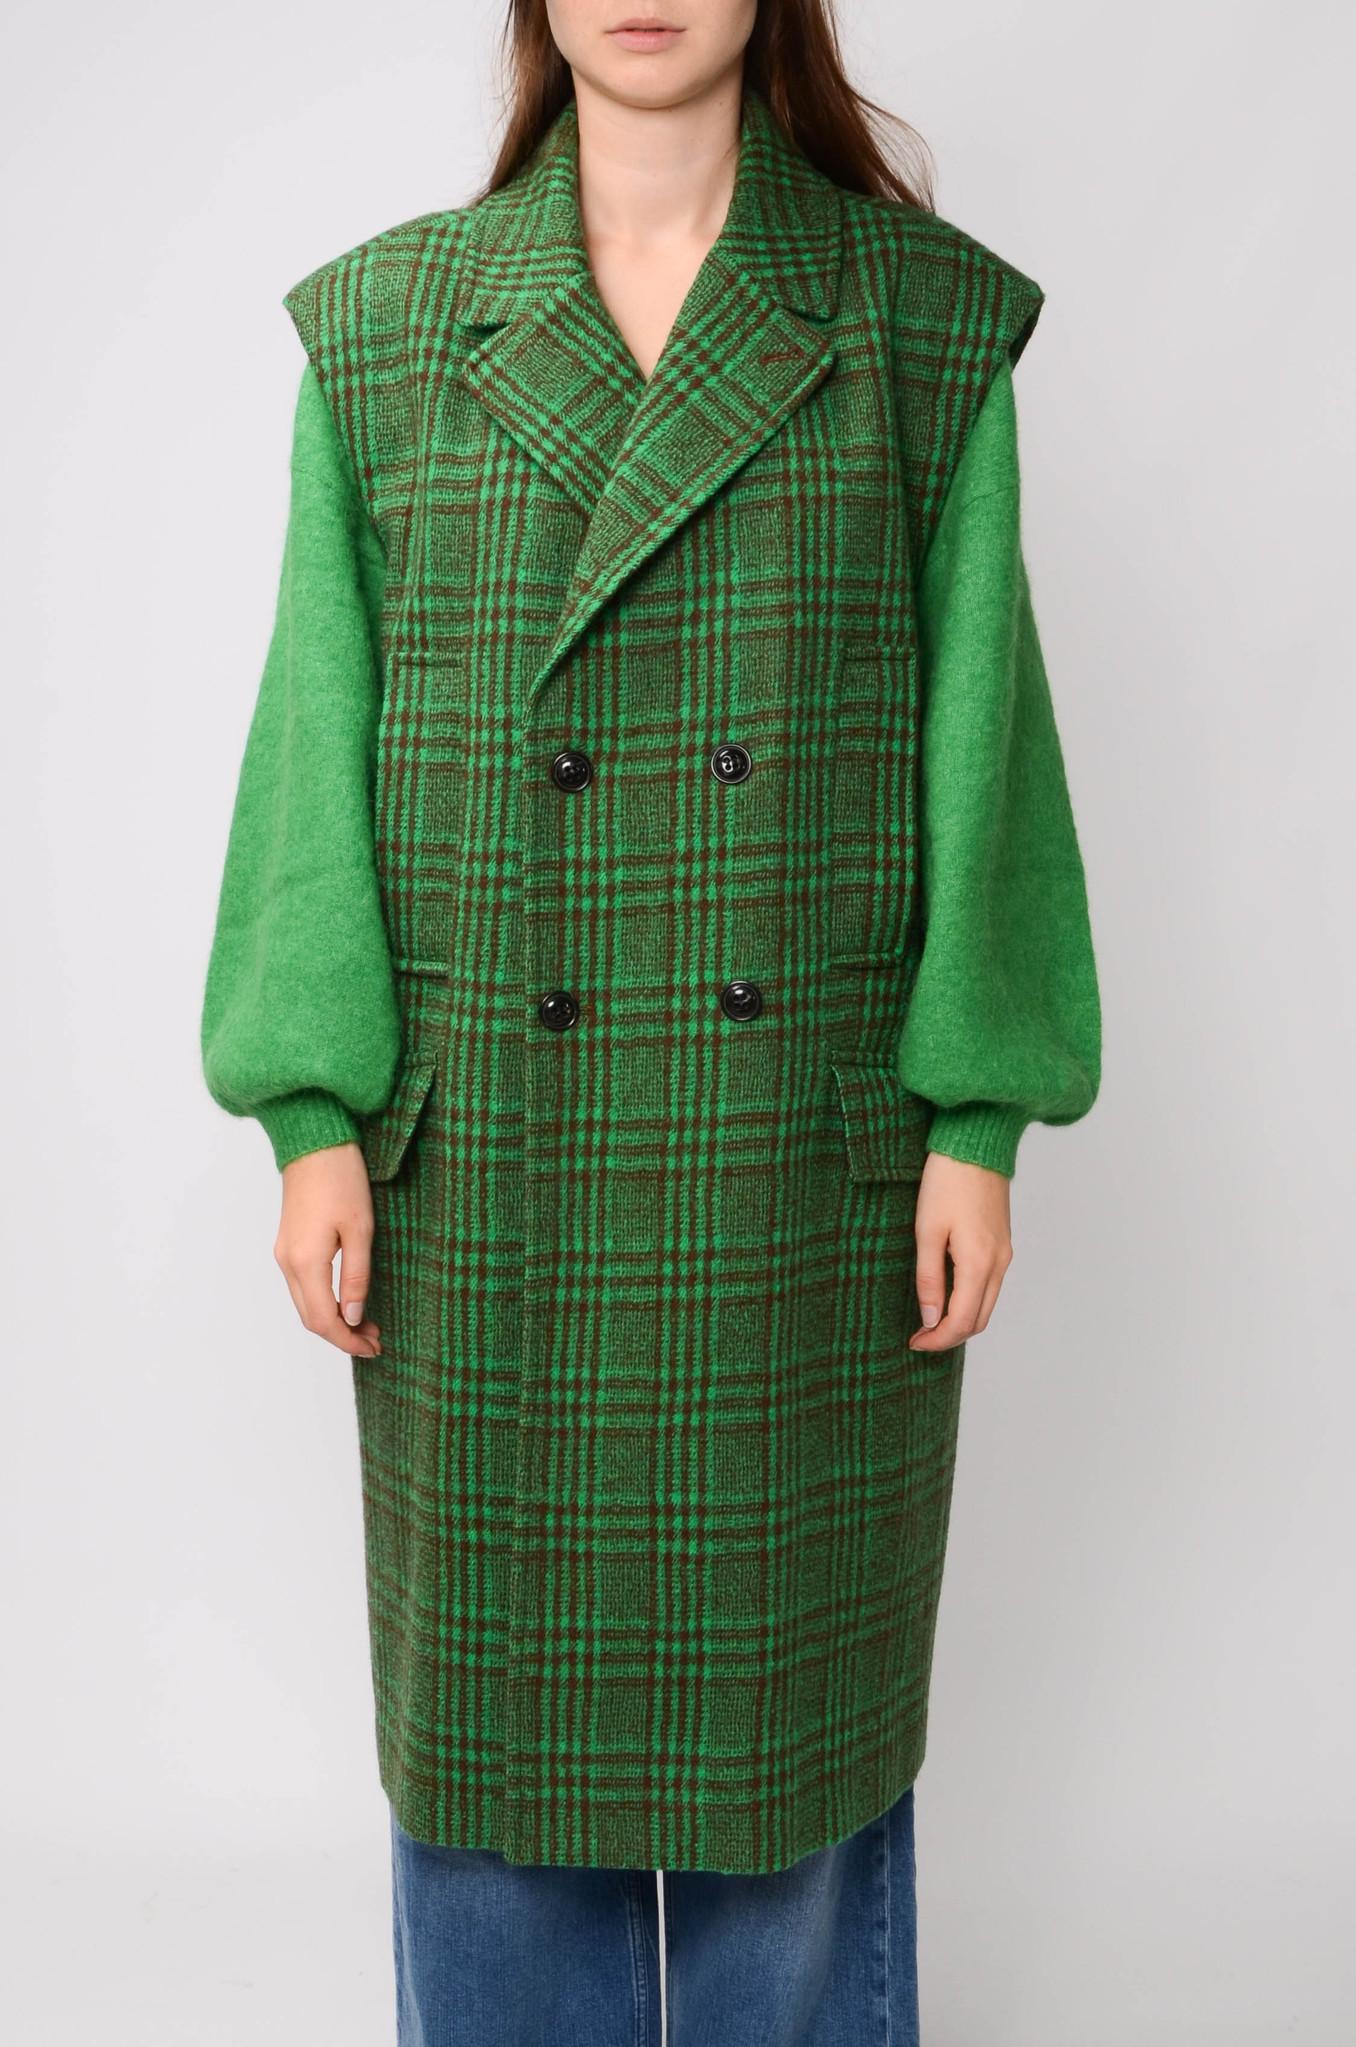 DECKA COAT IN GREEN CHECK-1